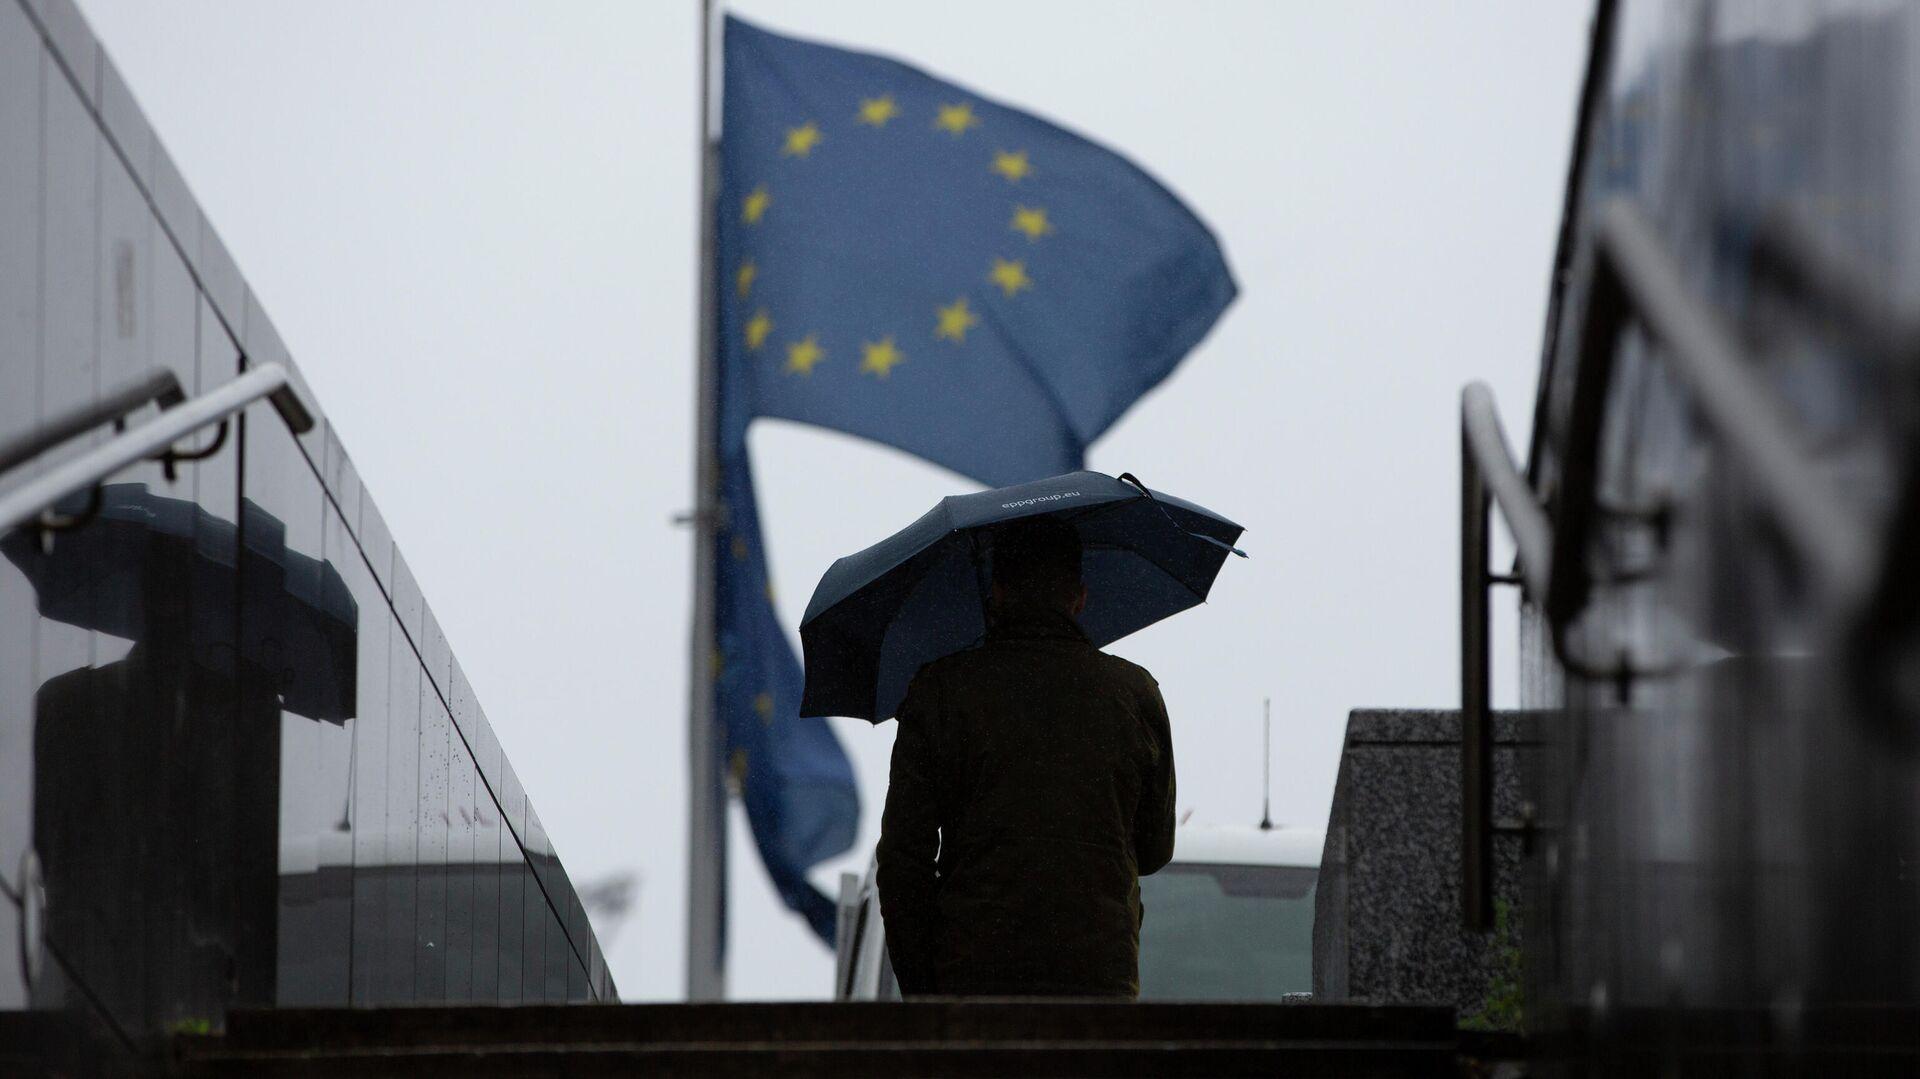 Мужчина проходит мимо штаб-квартиры ЕС в Брюсселе - РИА Новости, 1920, 15.10.2020